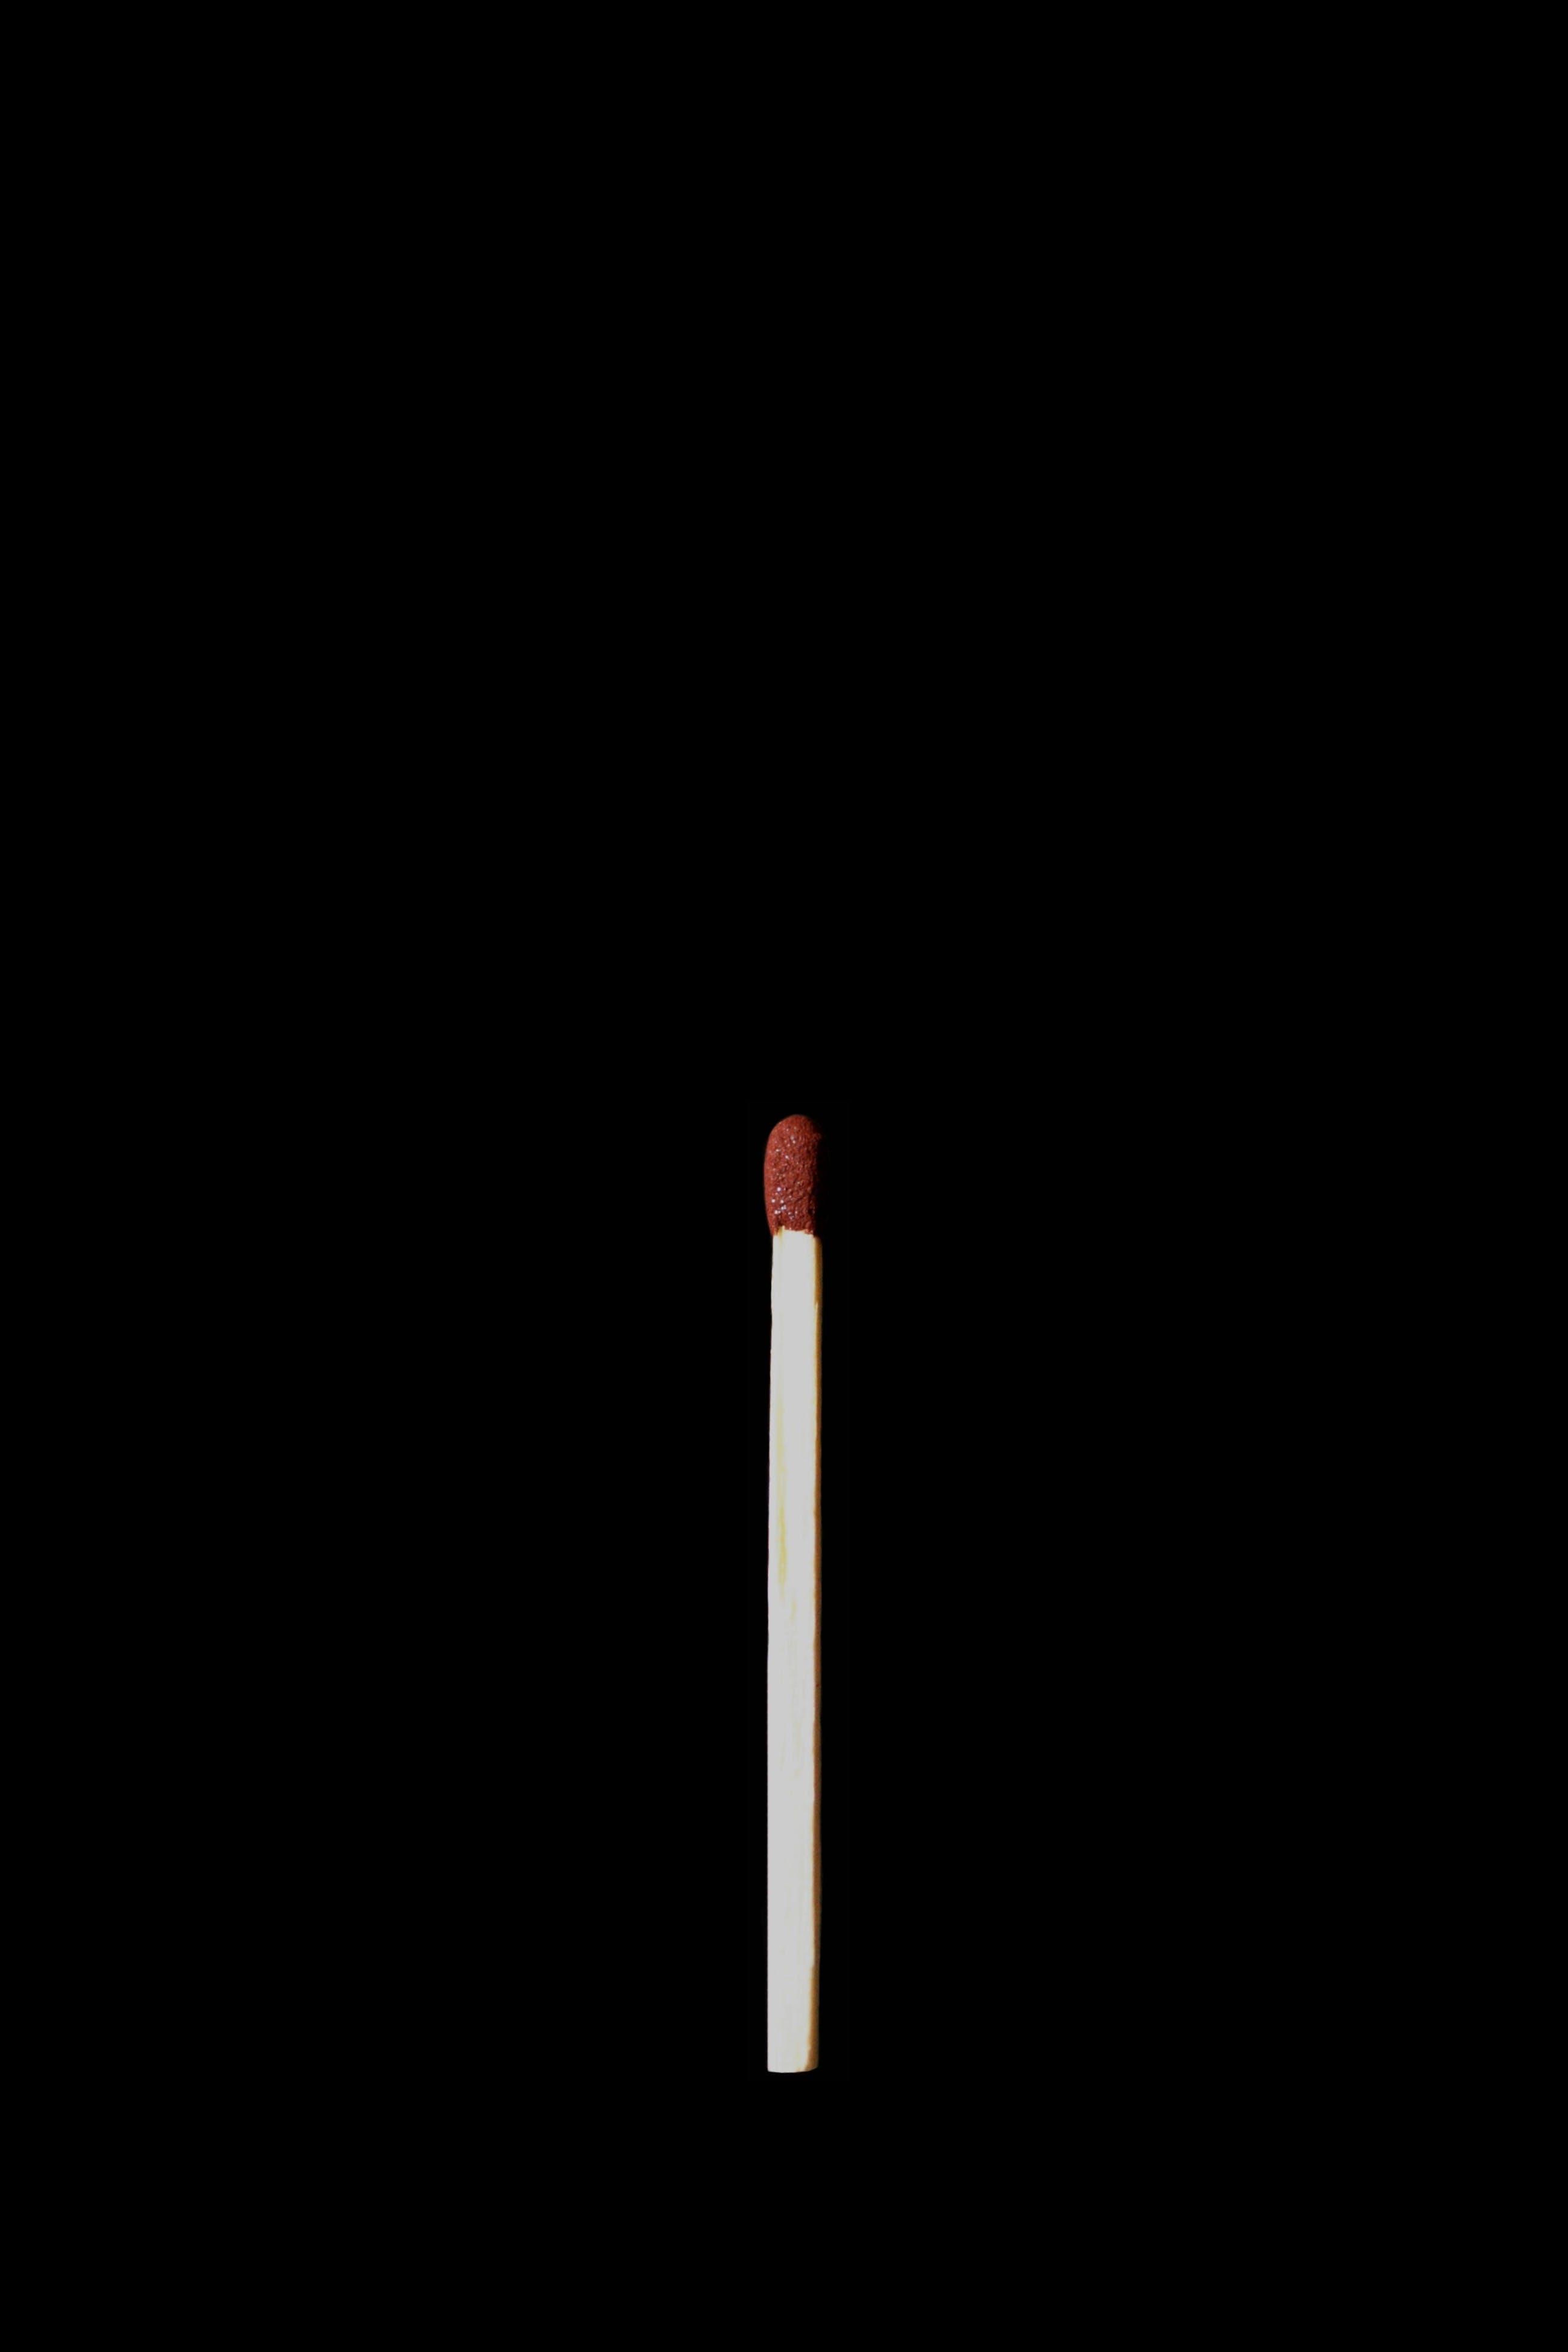 Fotos de stock gratuitas de cerilla, fondo negro, oscuro, palo